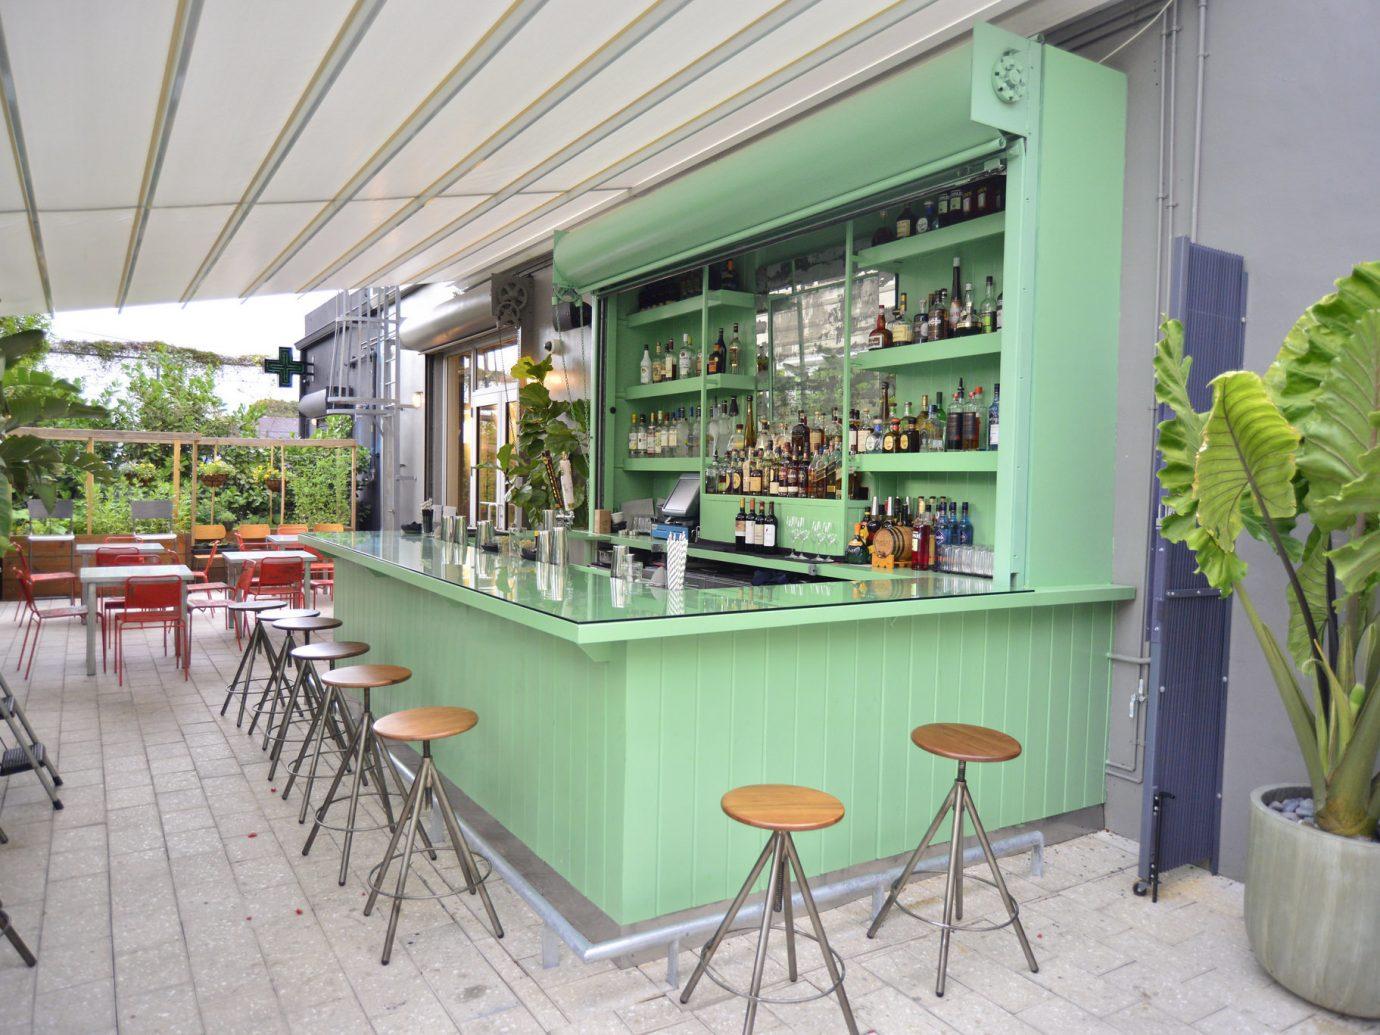 Trip Ideas ground green floristry restaurant retail interior design real estate outdoor structure plant furniture